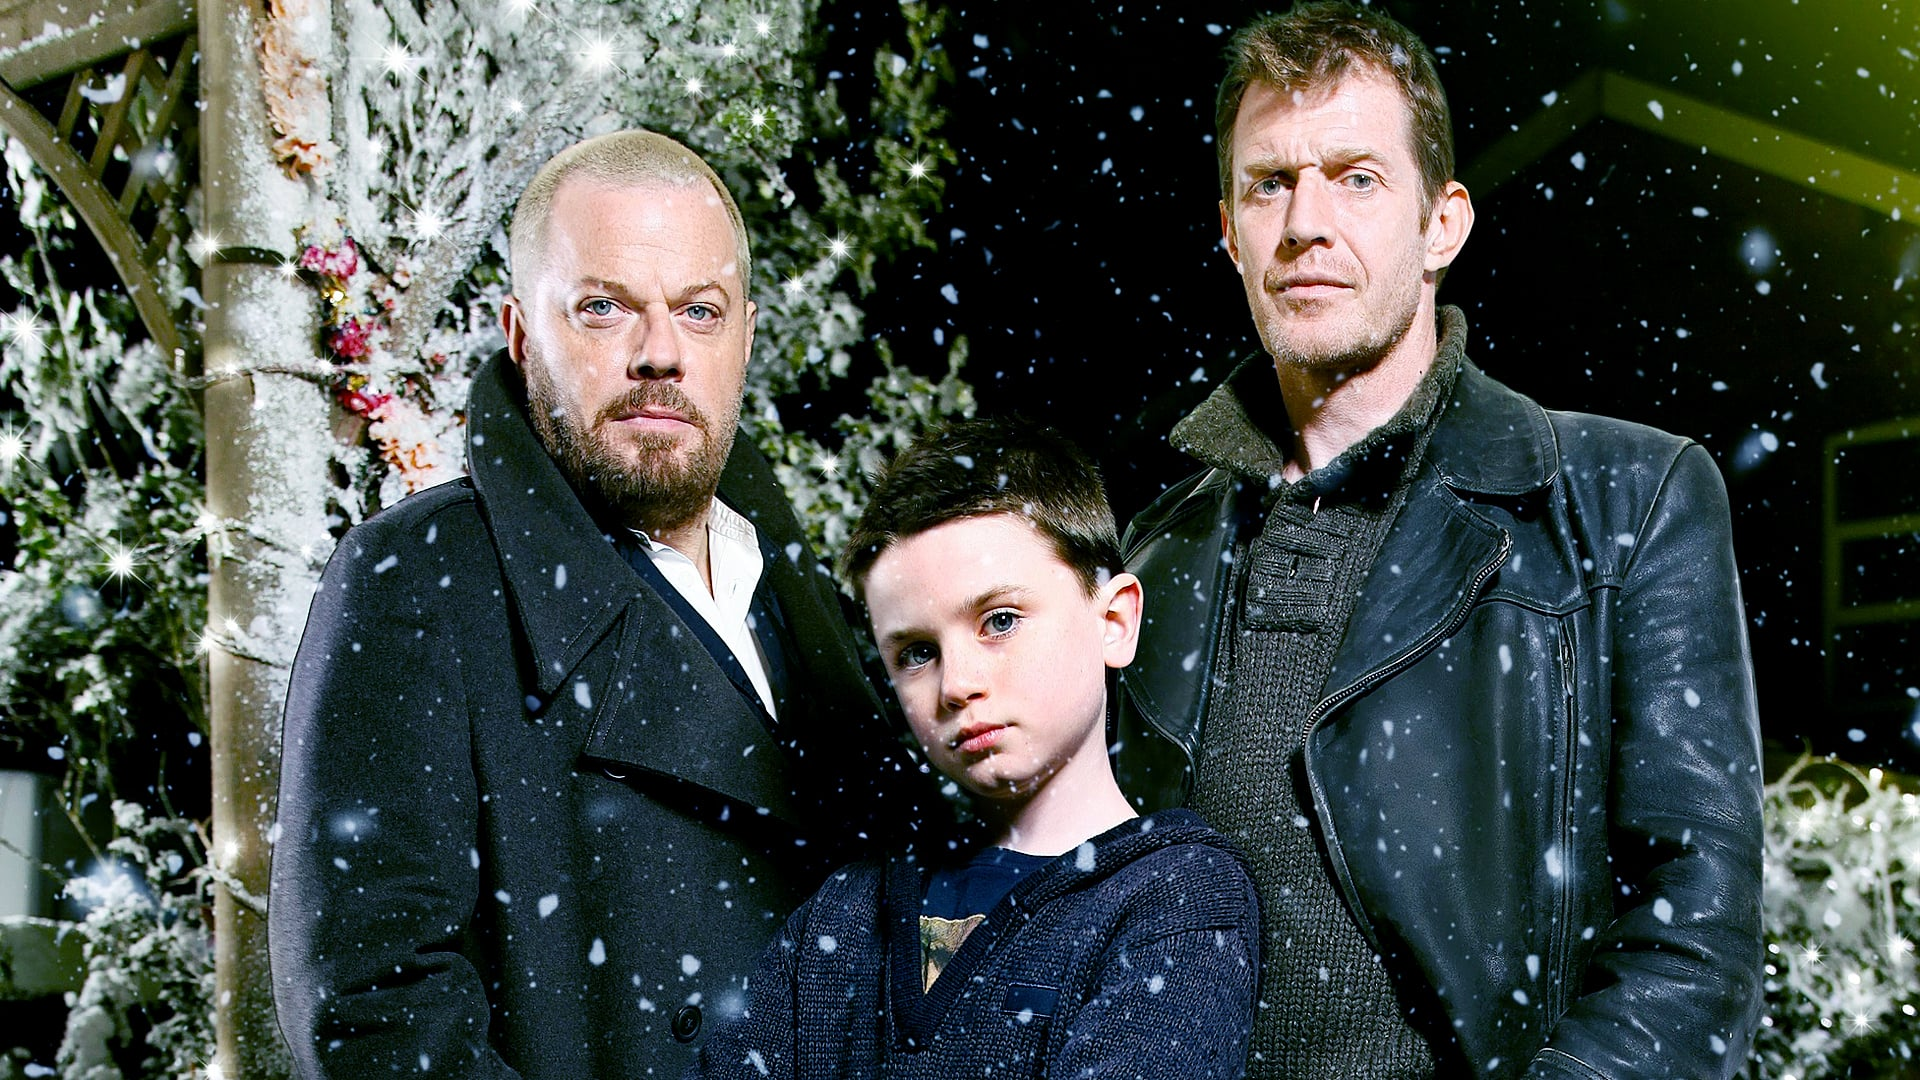 Regarder Lost Christmas en streaming gratuit